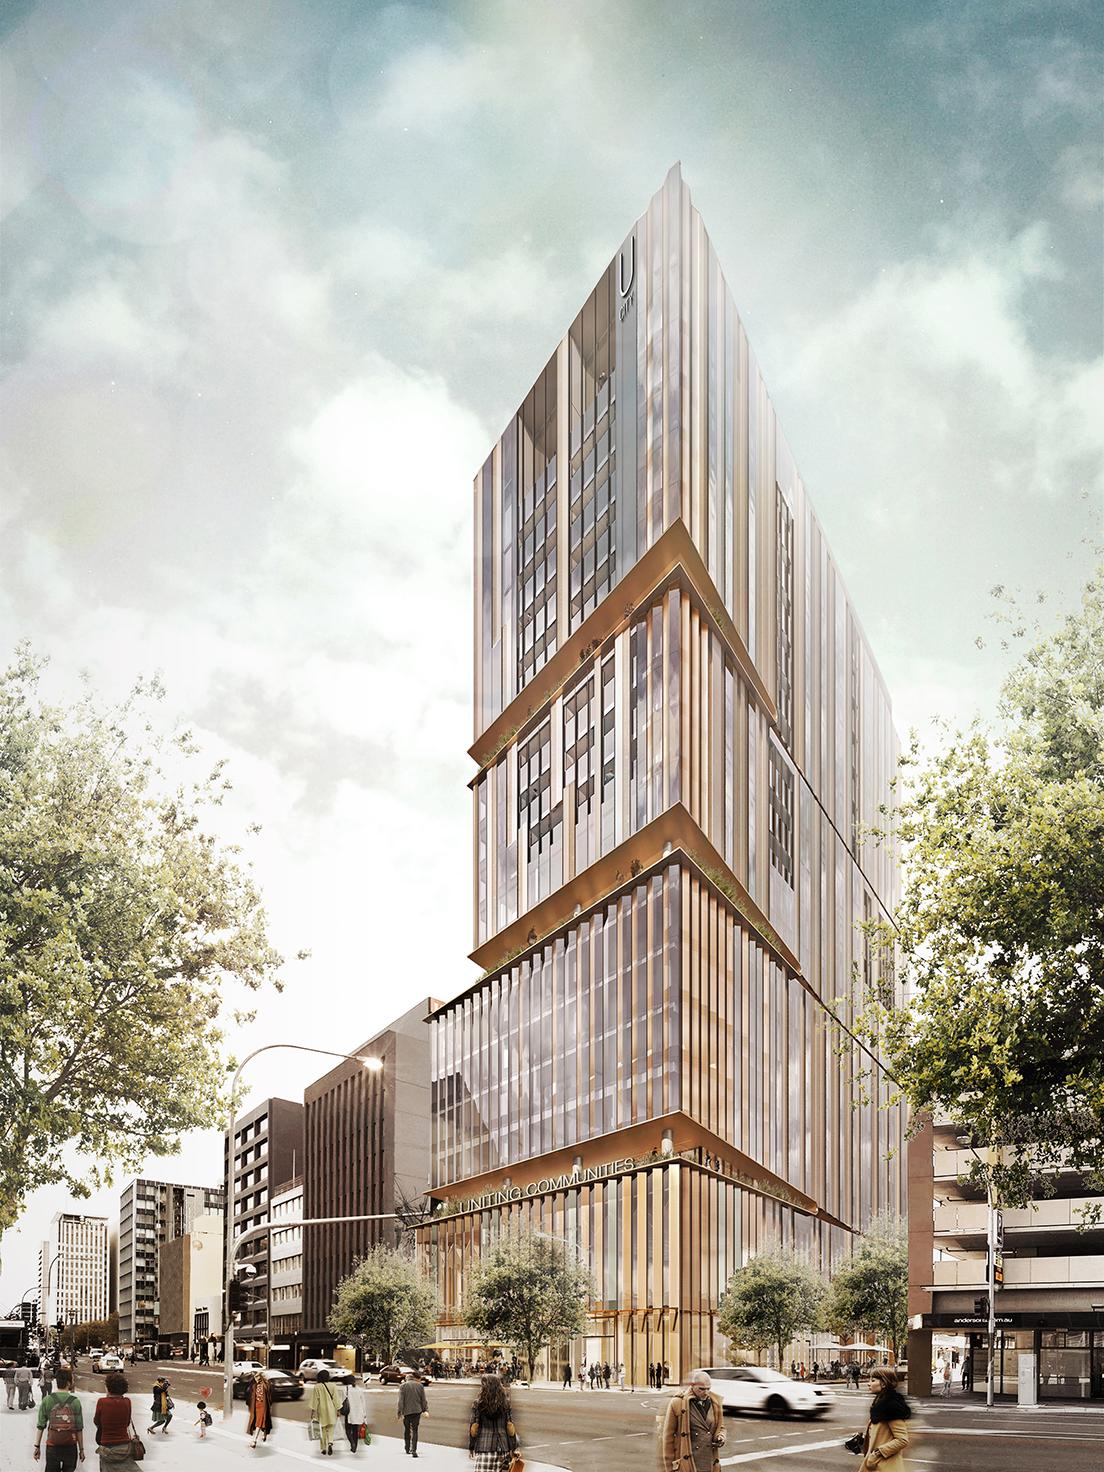 The new U City apartment building